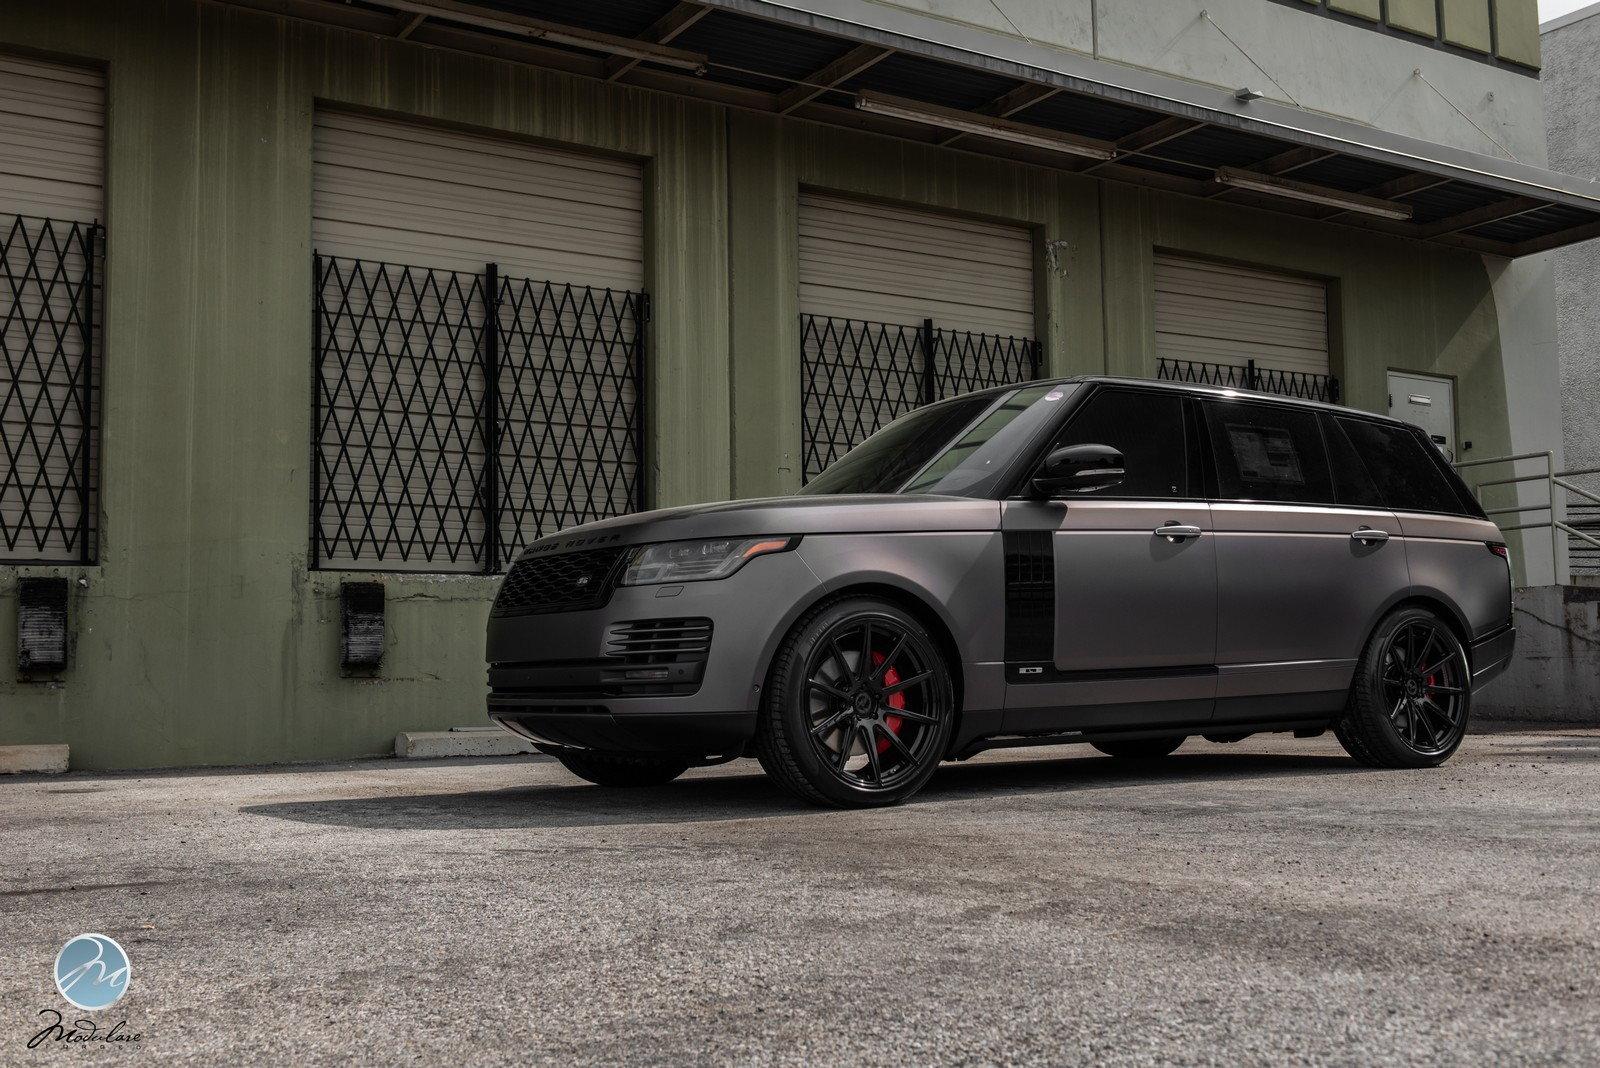 "How To Measure Wheel Base >> 2018 Range Rover LWB Matte Grey | 22"" Modulare B15 - 6SpeedOnline - Porsche Forum and Luxury Car ..."